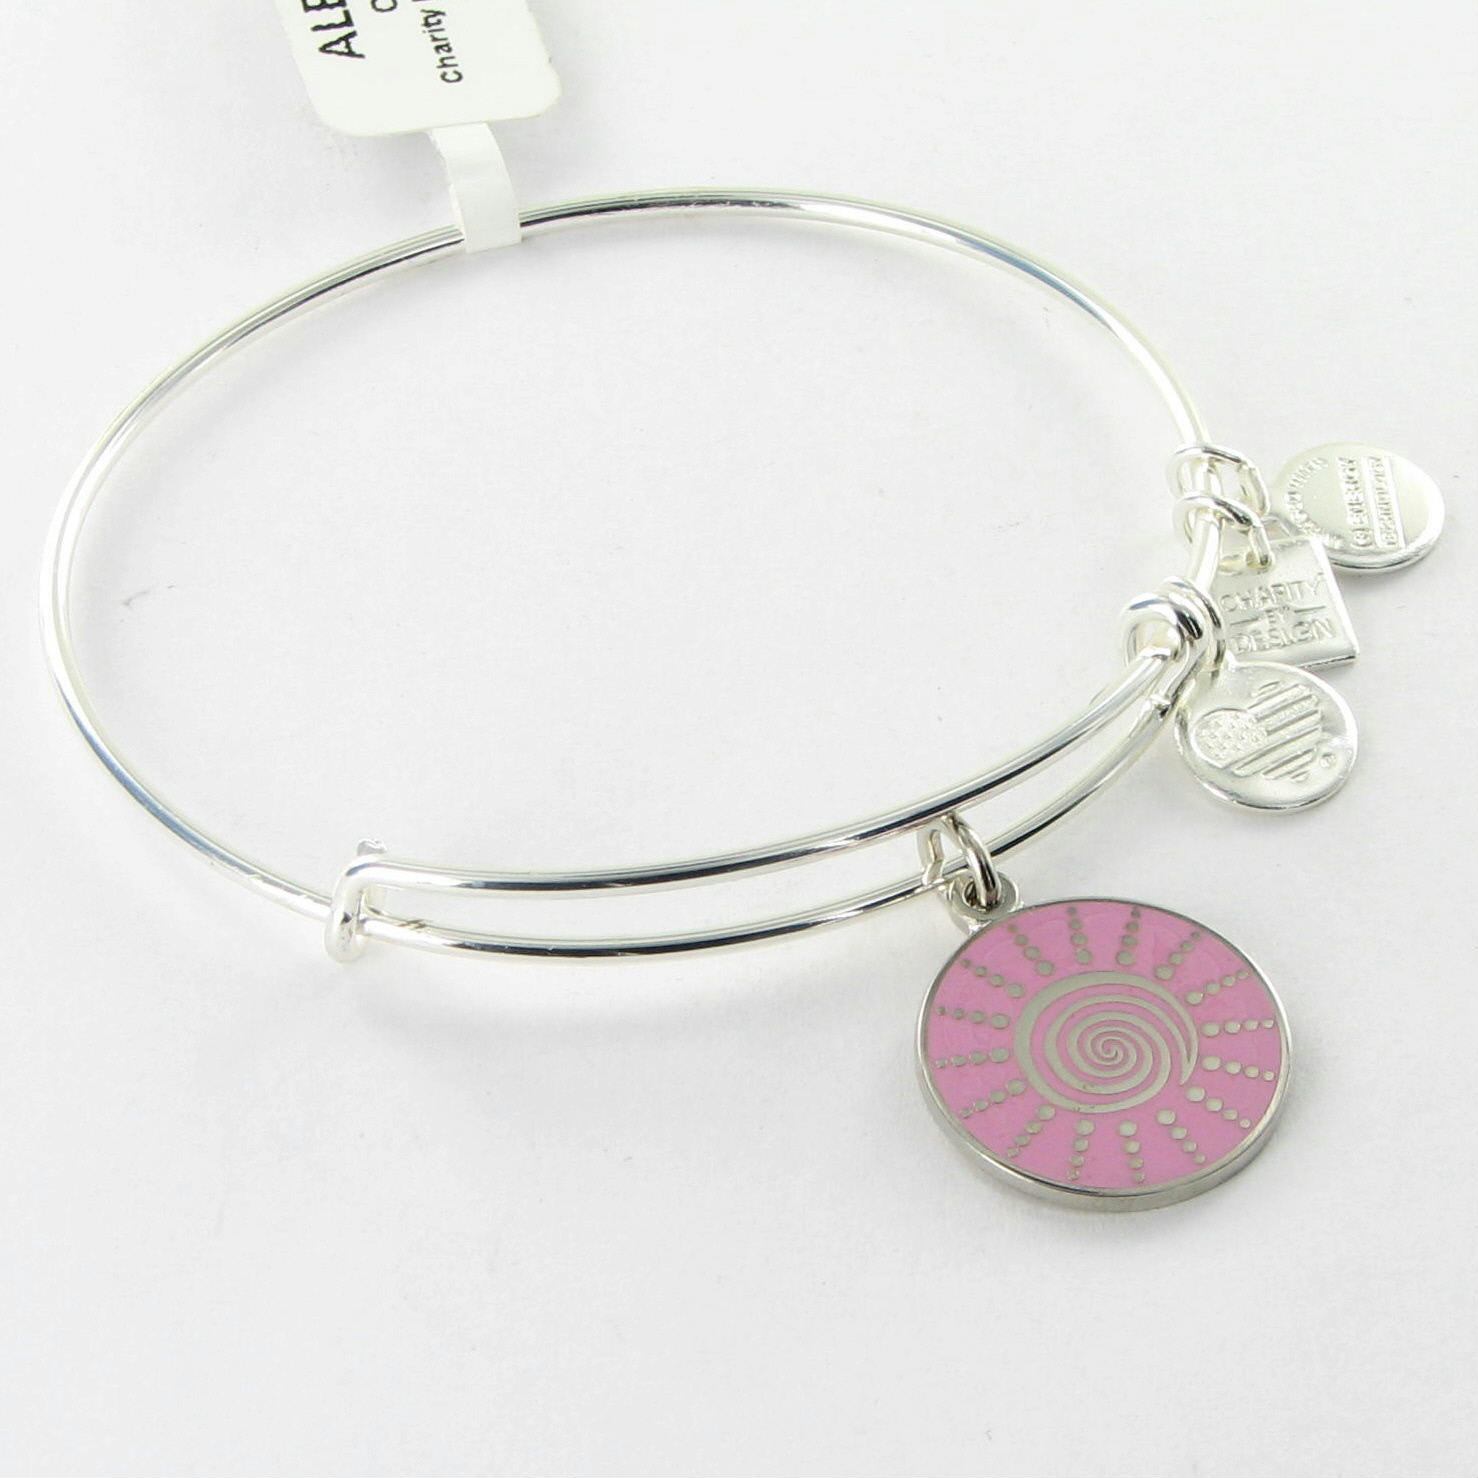 silver breast cancer bracelet bangle jpg 422x640